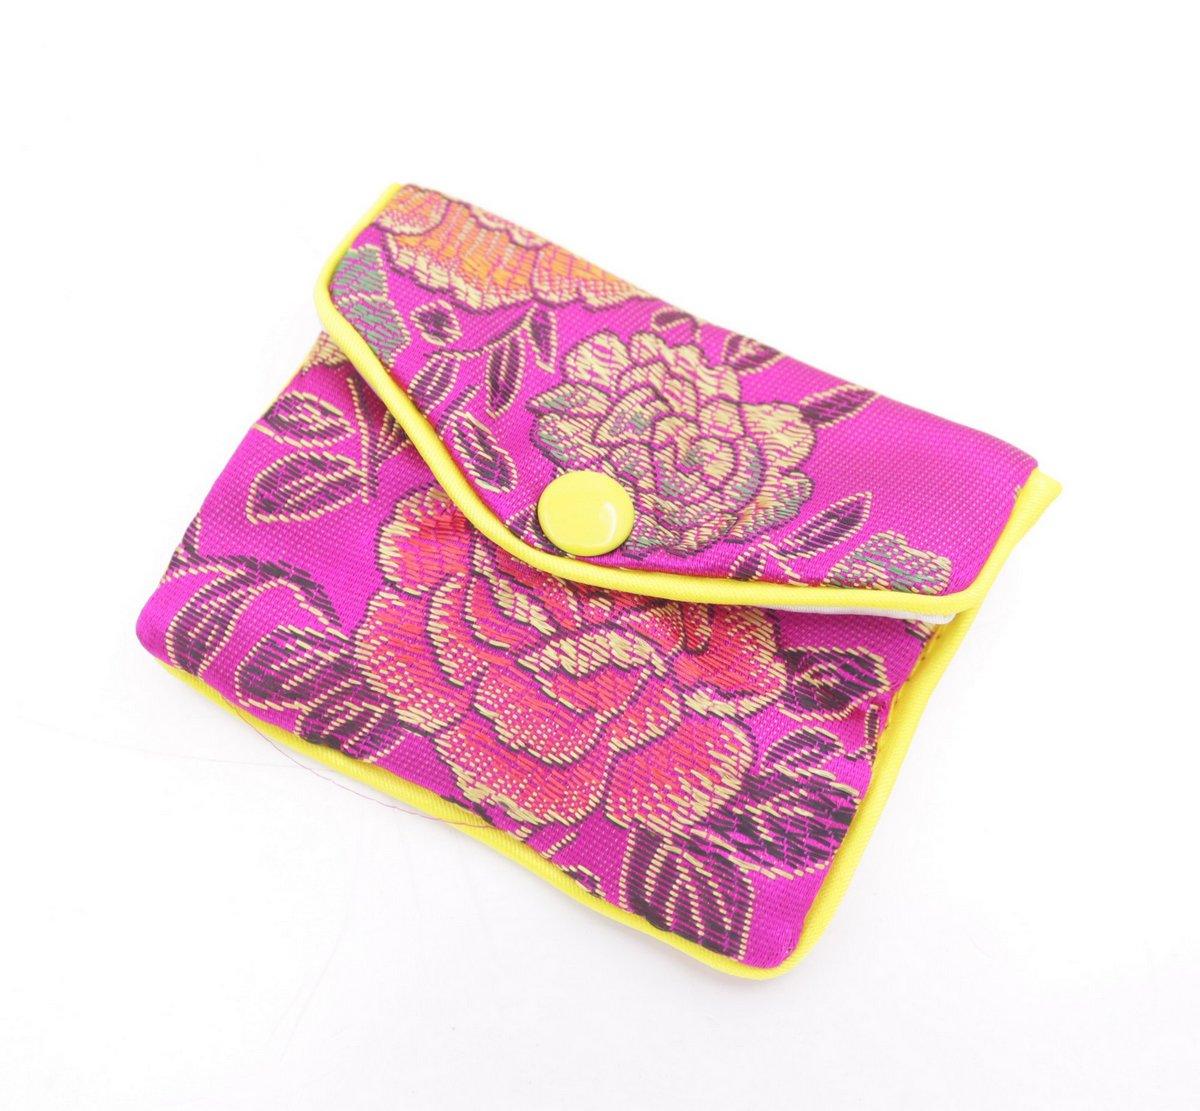 Купить с кэшбэком beauty 10 pcs pink flower baldachin cloth gift jewelry bags pouches 65mmx80mm